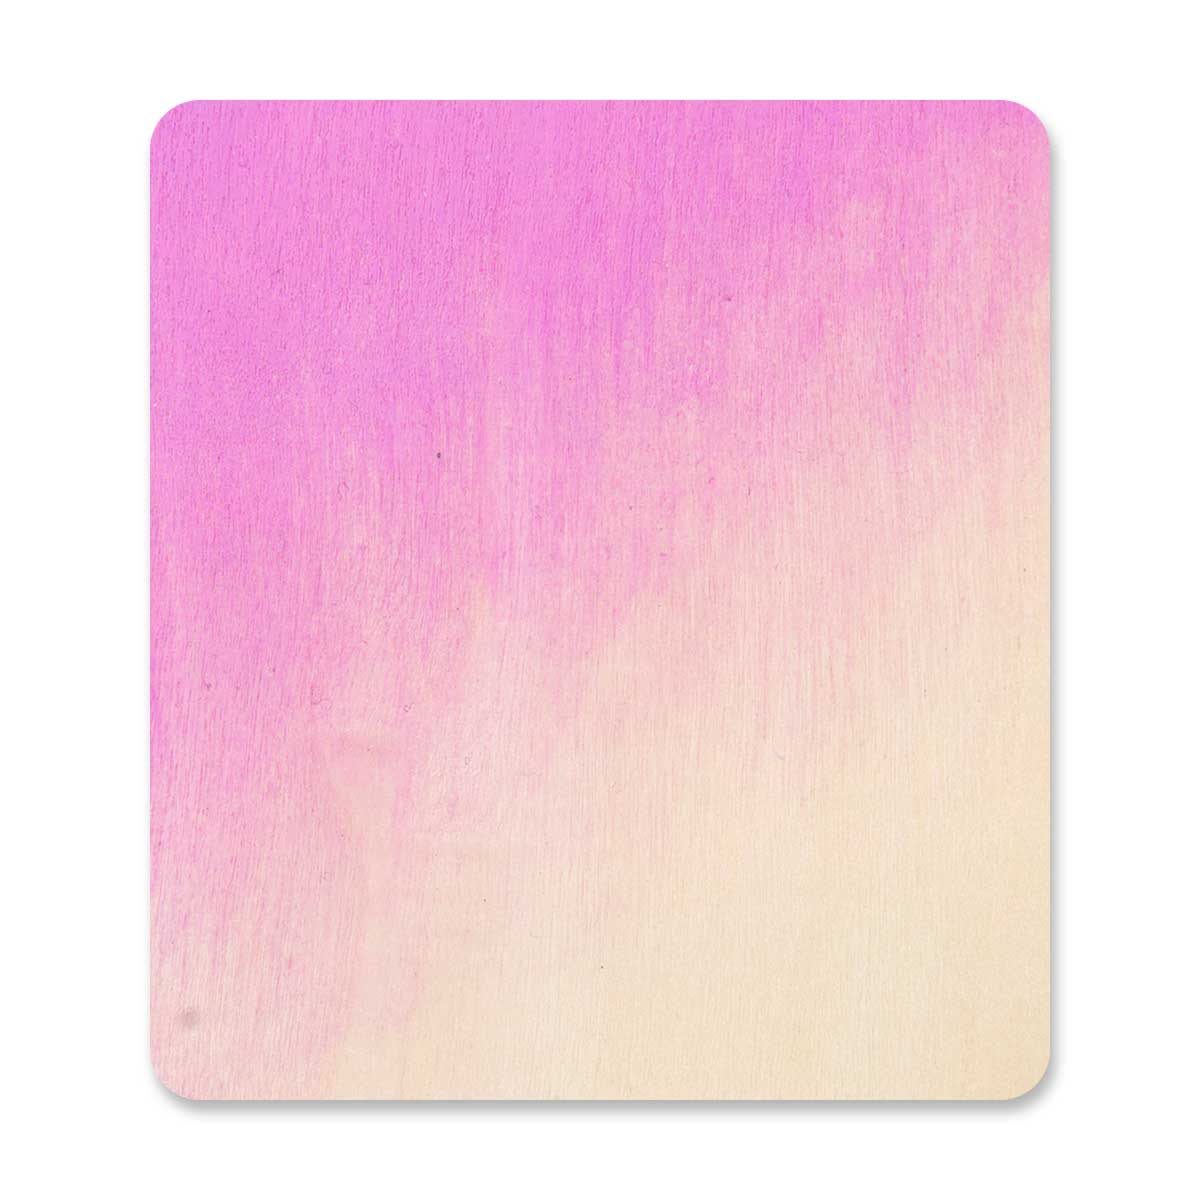 FolkArt ® Watercolor Acrylic Paint™ - Opera, 2 oz. - 18113